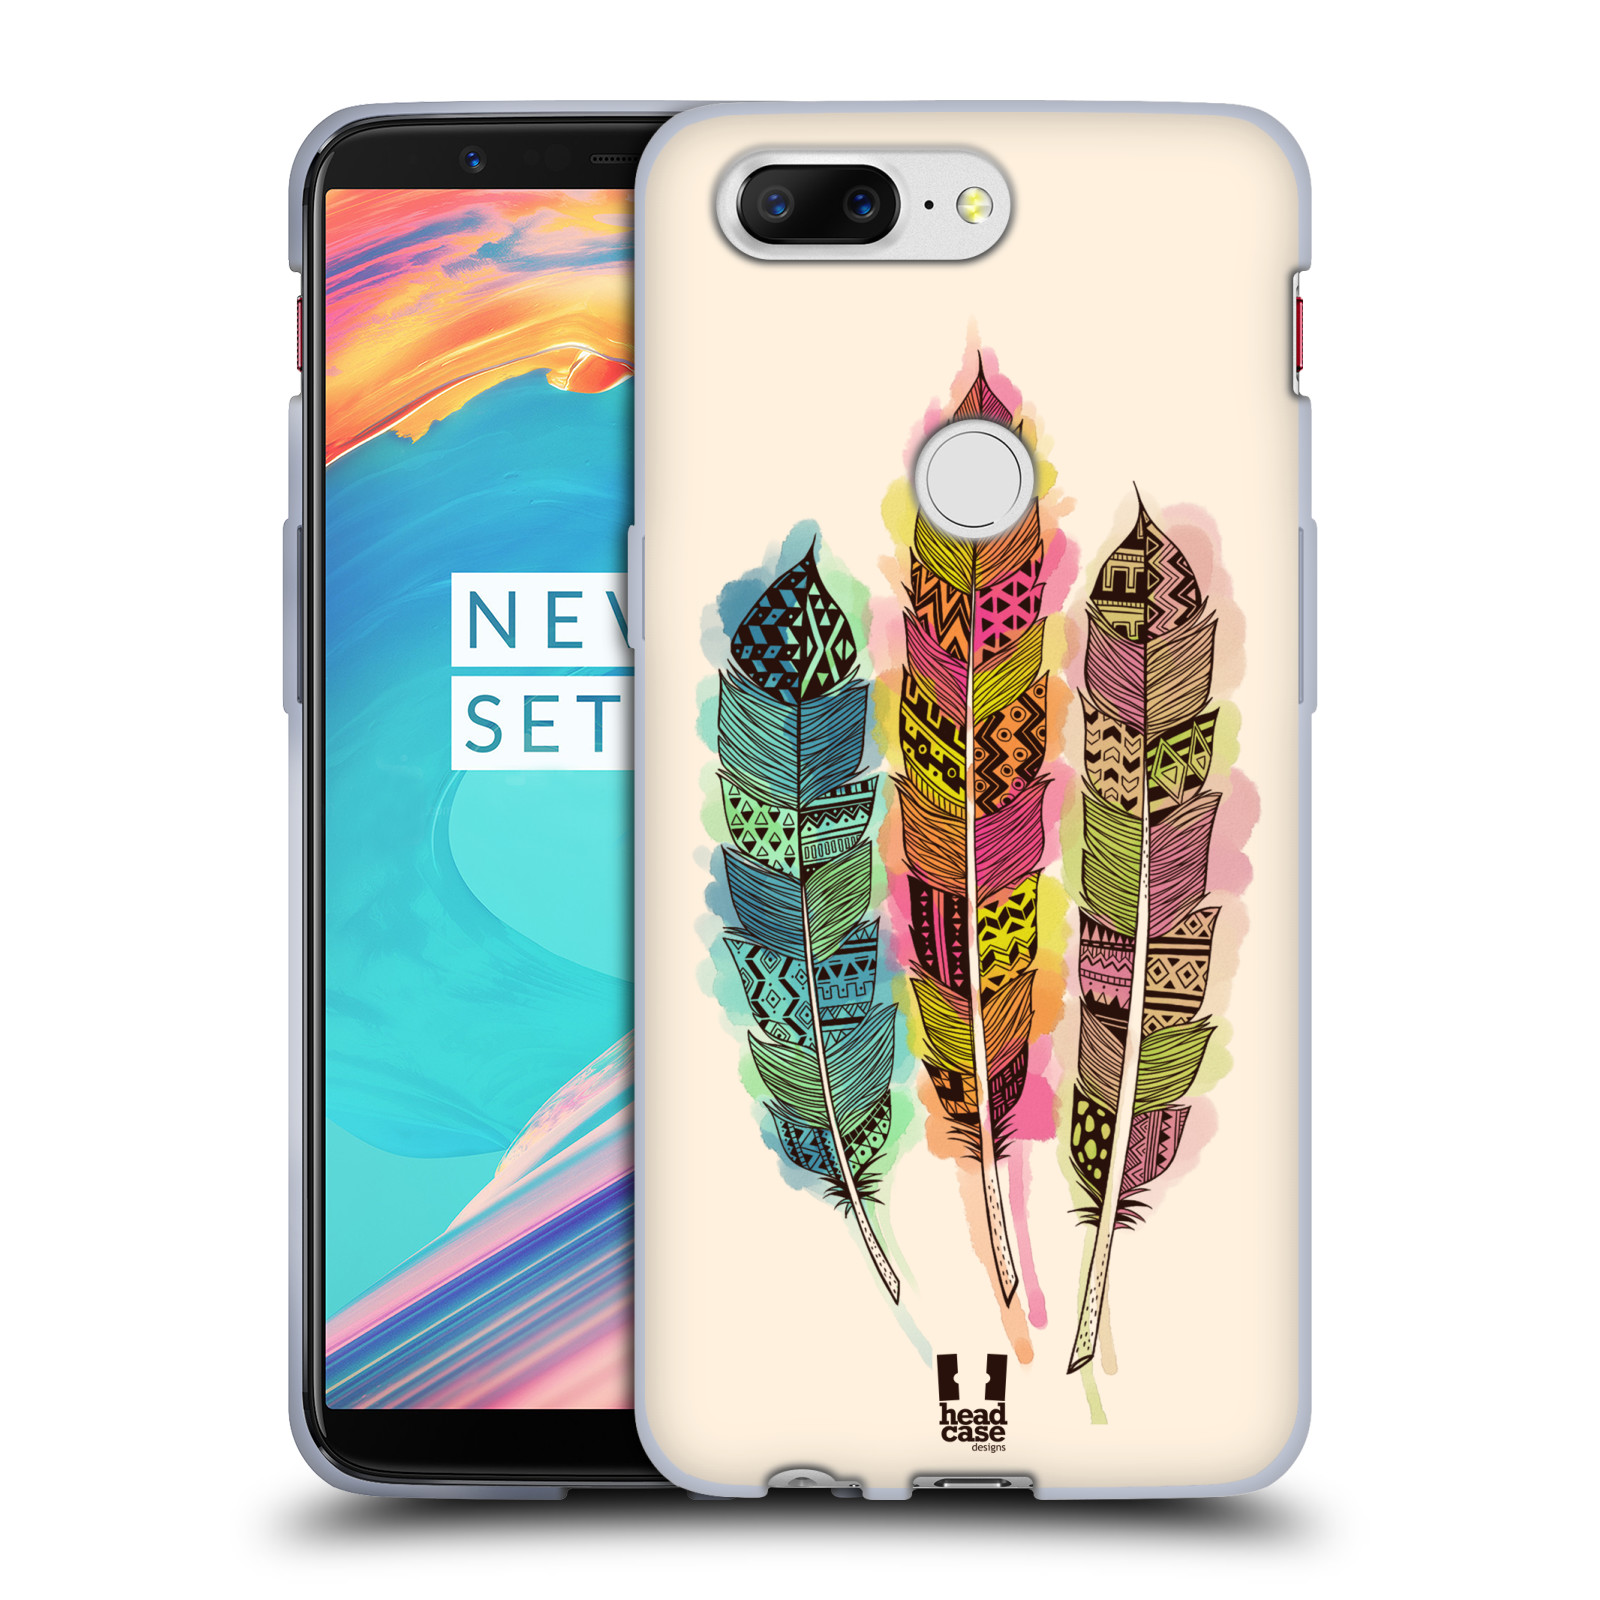 Silikonové pouzdro na mobil OnePlus 5T - Head Case - AZTEC PÍRKA SPLASH